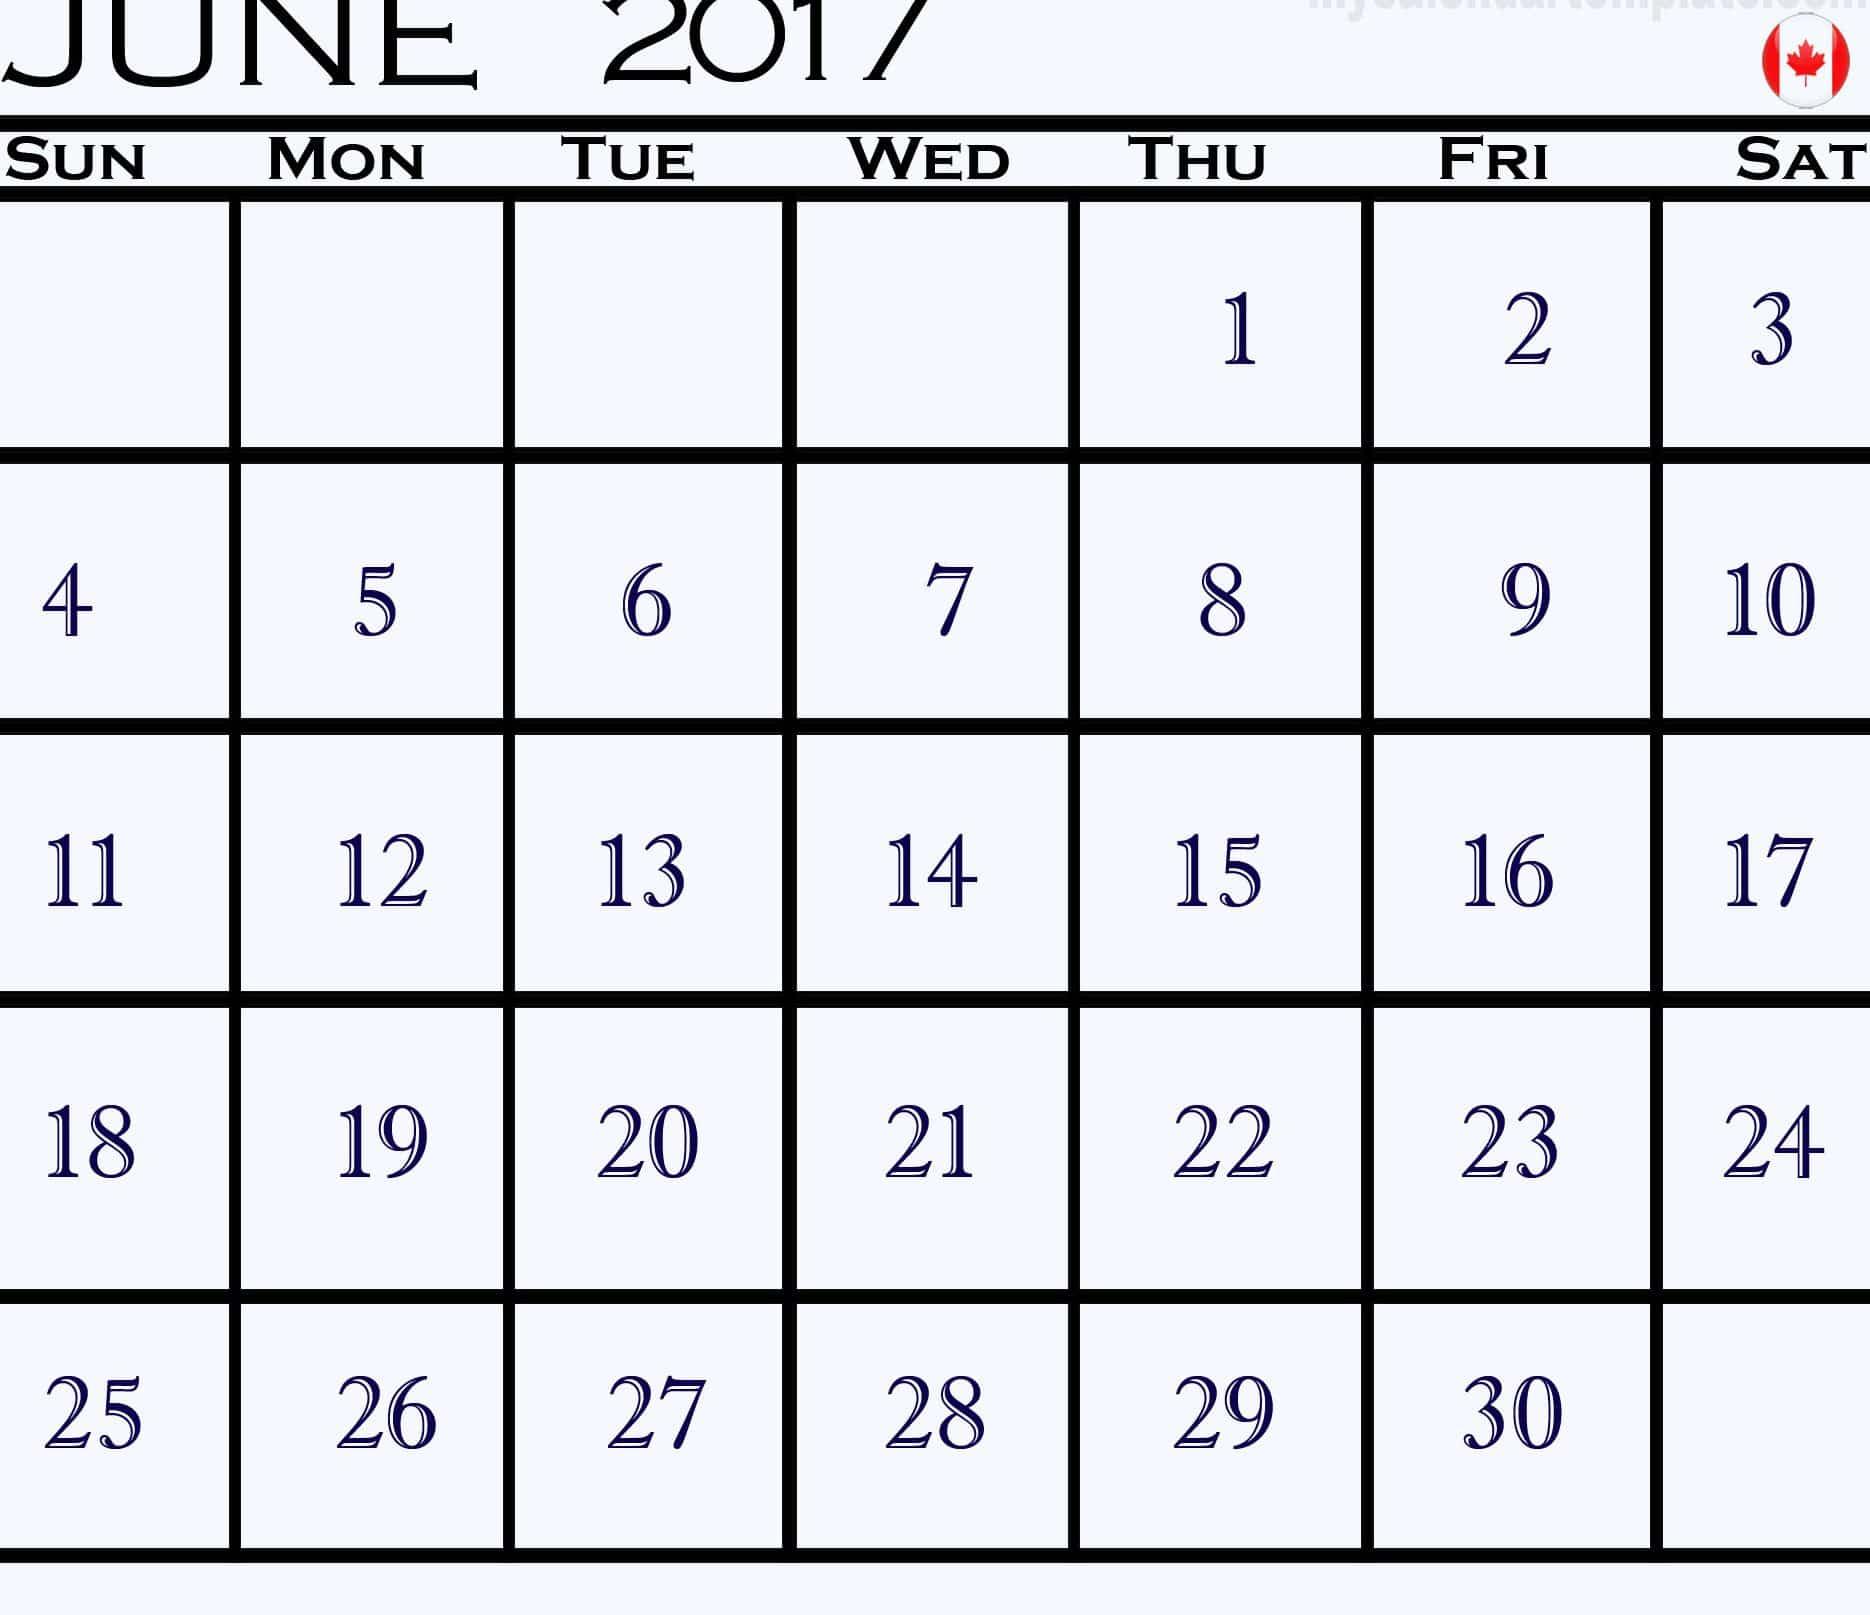 June 2017 calendar Canada